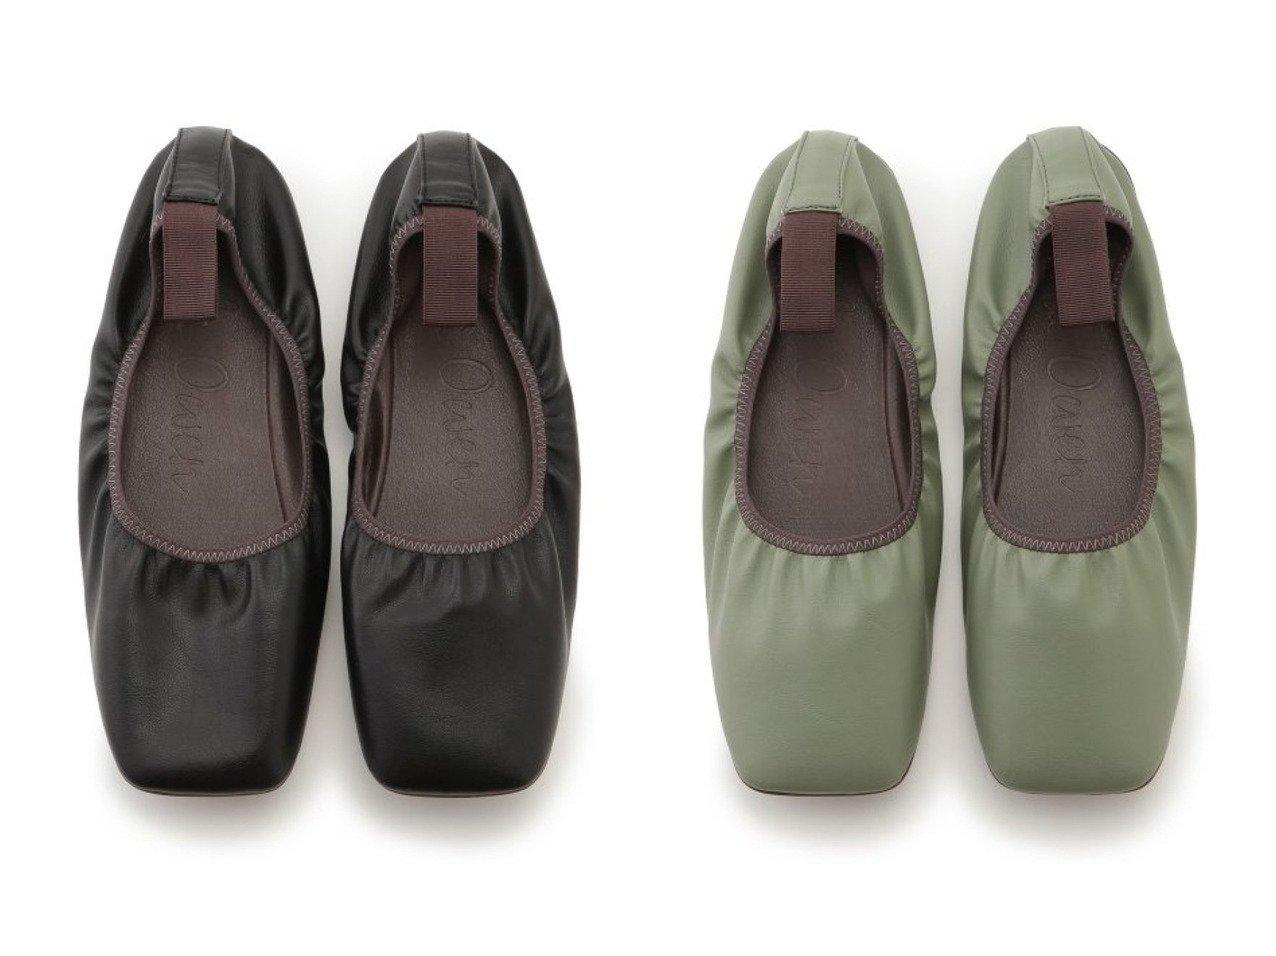 【Mila Owen/ミラオーウェン】の履き口ゴムソフトバレエシューズ シューズ・靴のおすすめ!人気、トレンド・レディースファッションの通販  おすすめで人気の流行・トレンド、ファッションの通販商品 メンズファッション・キッズファッション・インテリア・家具・レディースファッション・服の通販 founy(ファニー) https://founy.com/ ファッション Fashion レディースファッション WOMEN グログラン シューズ ストレッチ スニーカー スリッポン バレエ フェイクレザー フラット |ID:crp329100000009831